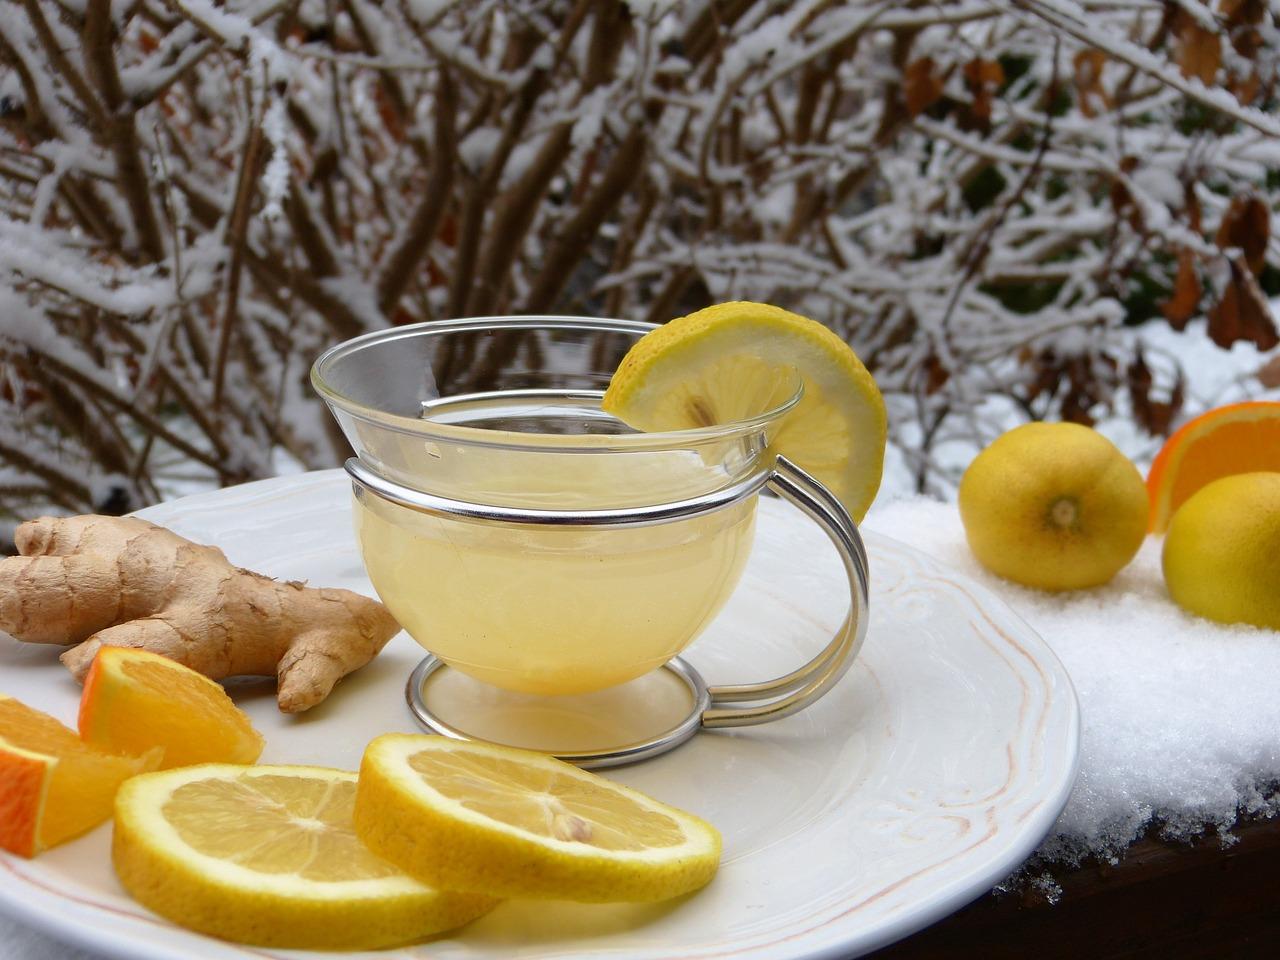 7 Makanan Terbaik Untuk Meningkatkan Sistem Imunitas